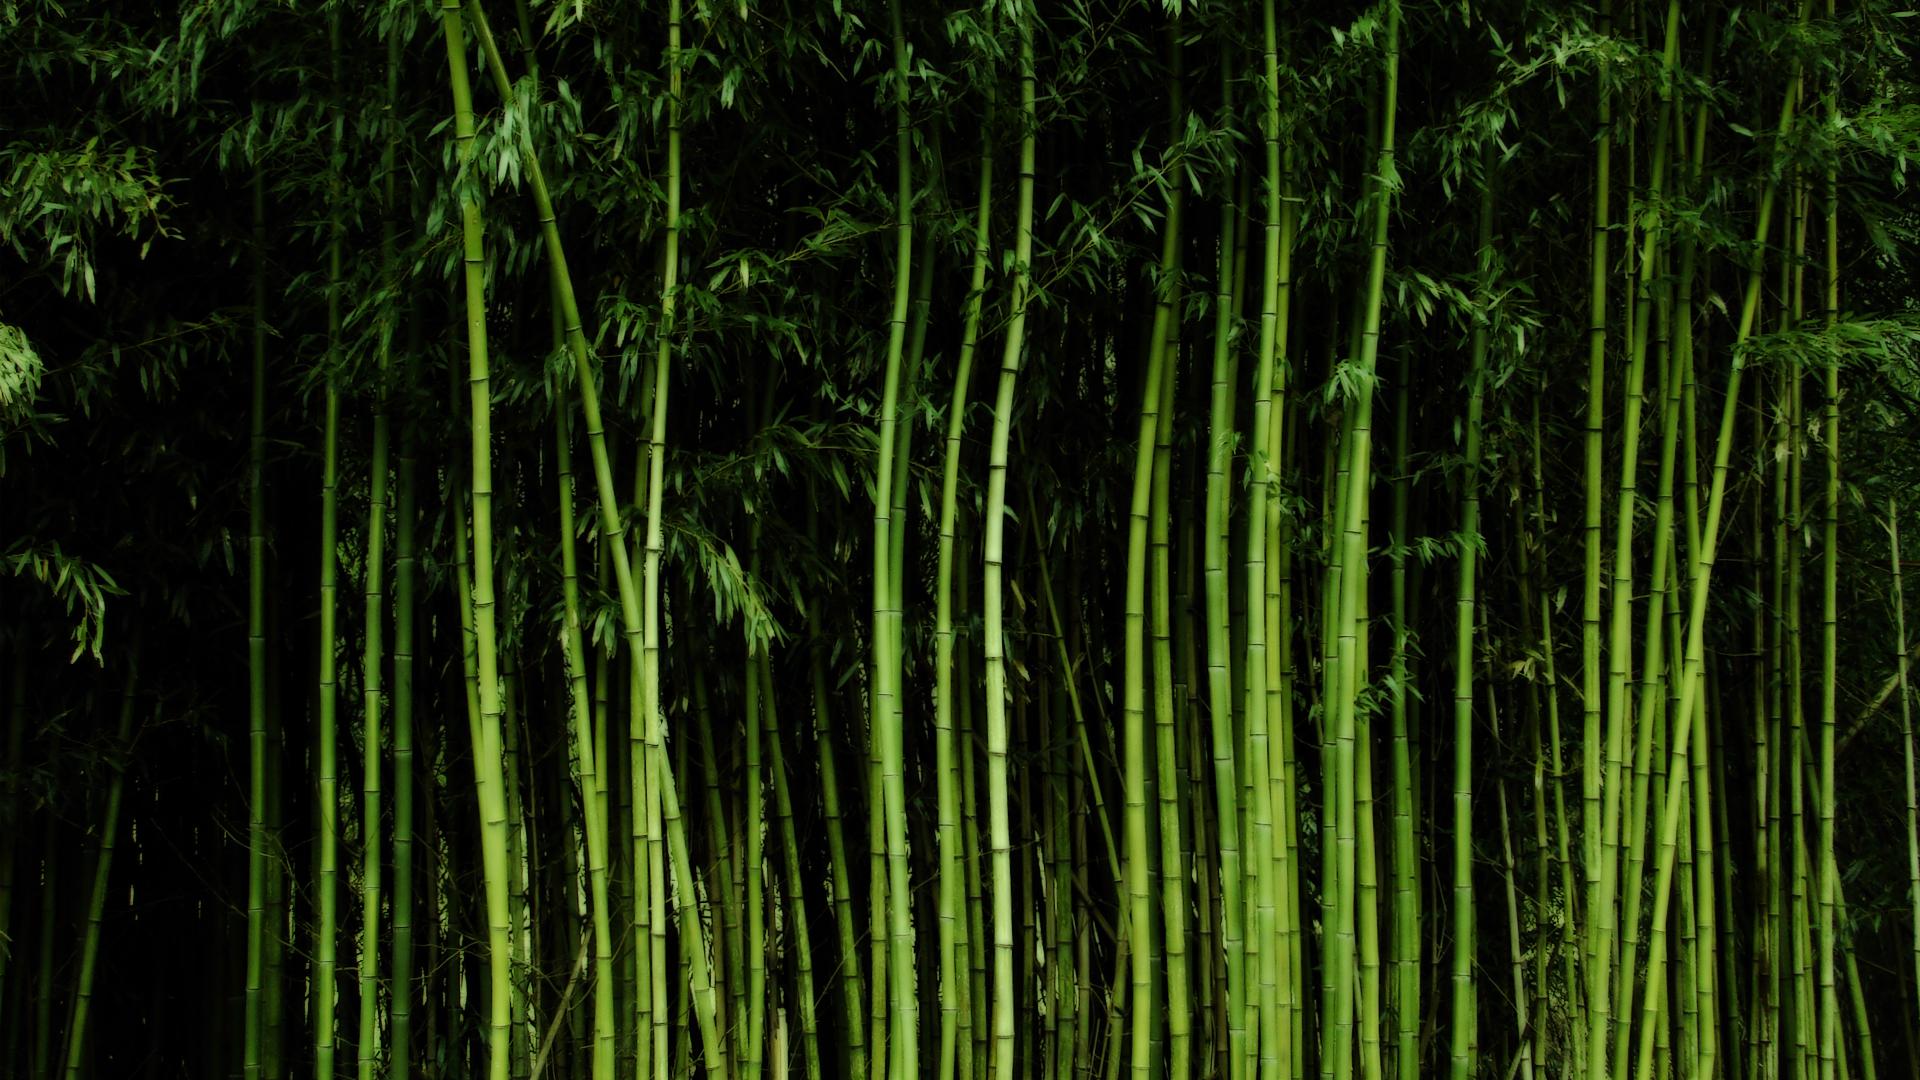 Free Computer Fall Wallpaper Hd Bamboo Backgrounds Download Pixelstalk Net